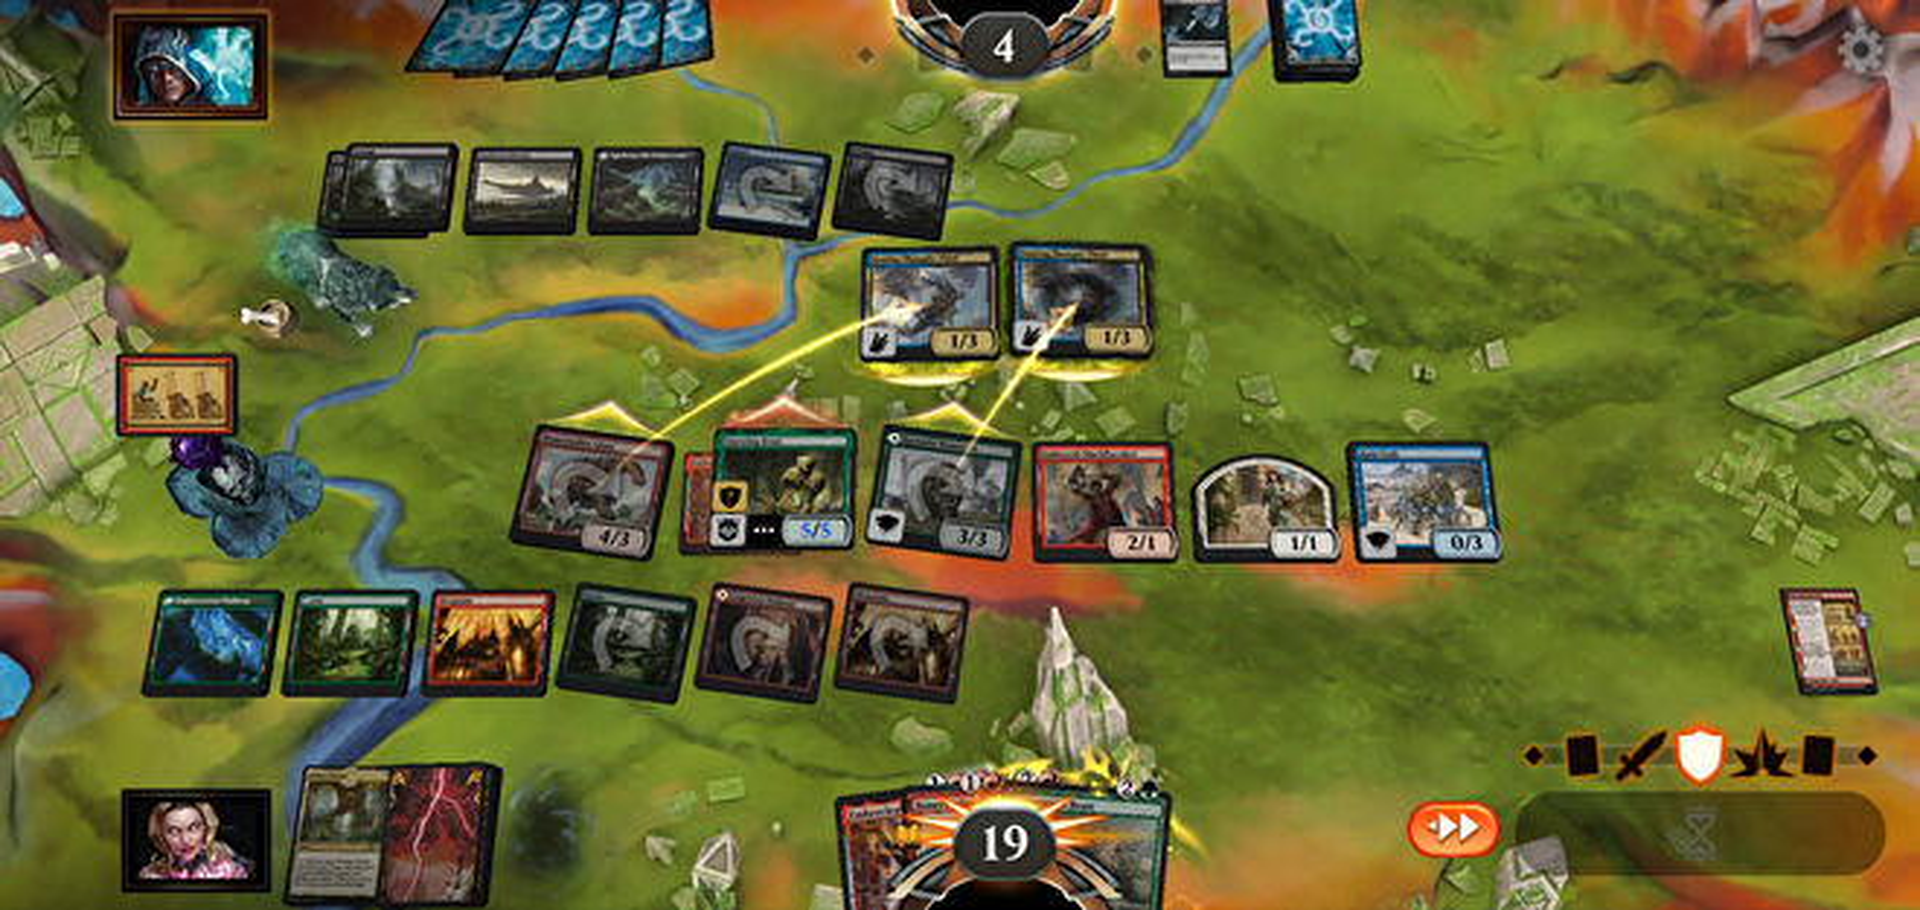 mtg-arena-mobile-gameplay.jpeg